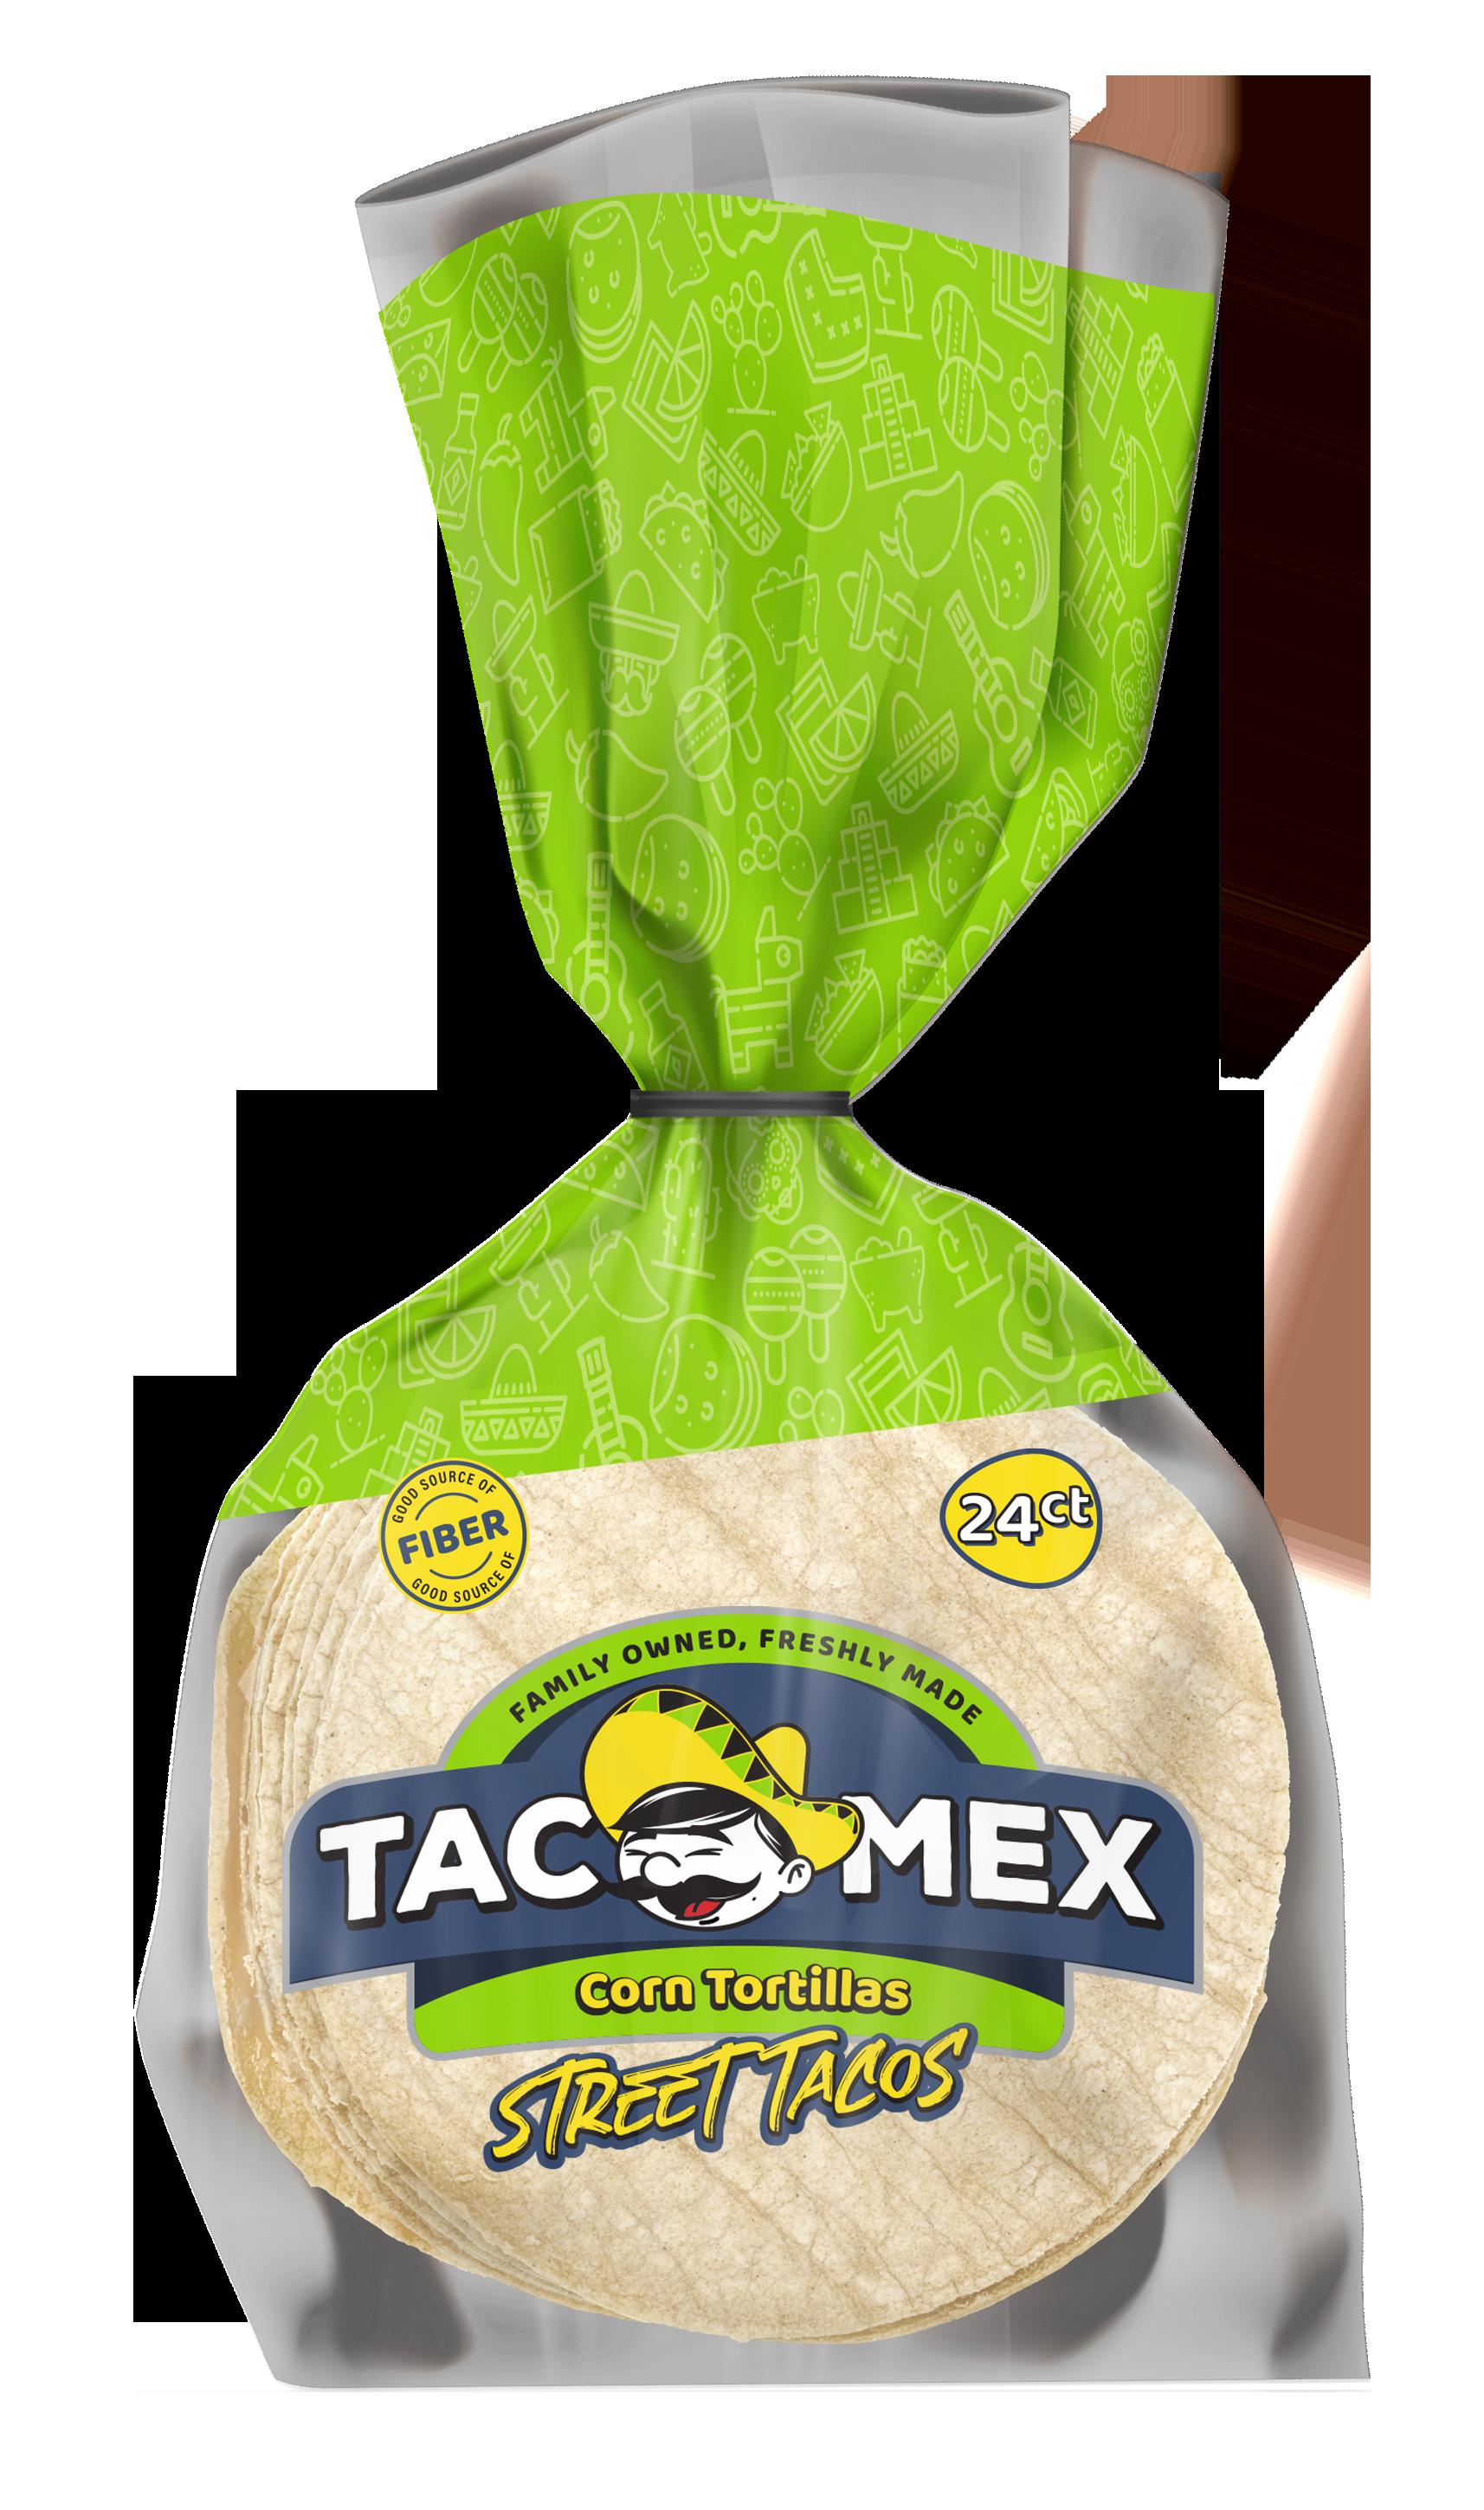 TacoMex Street Taco Corn Tortillas